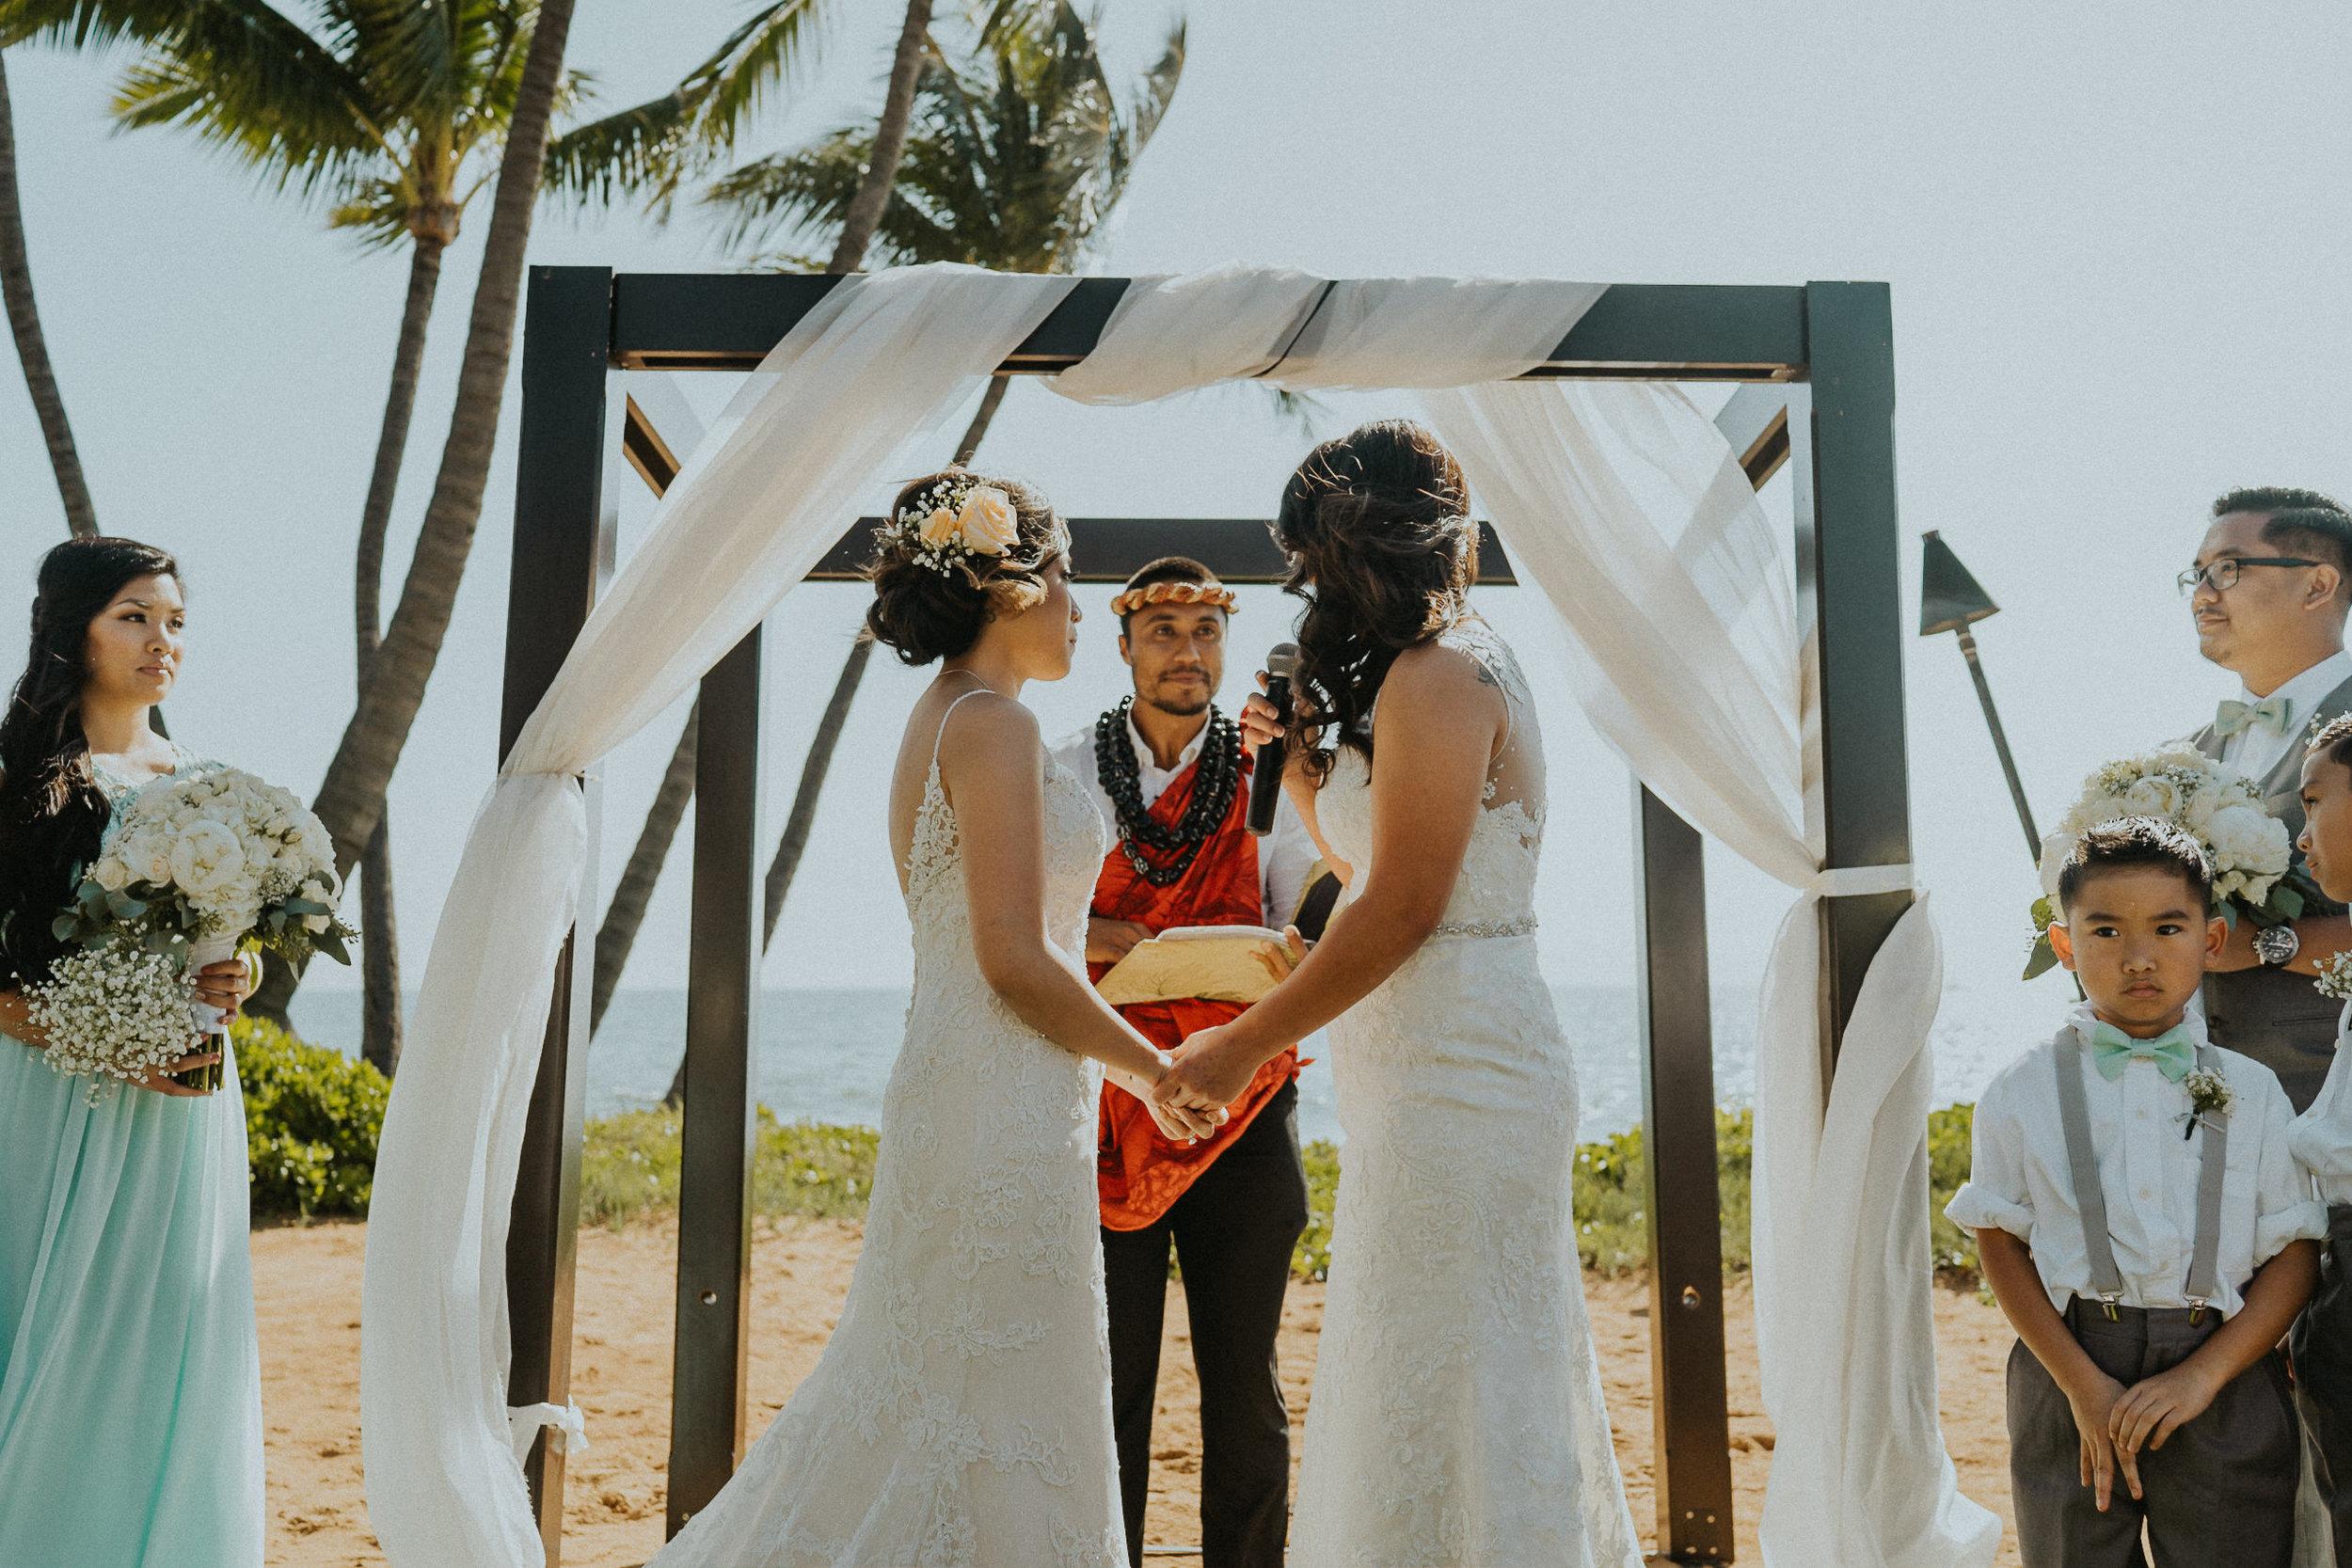 Maui_Destination_wedding_Alfred_Tang-8.jpg